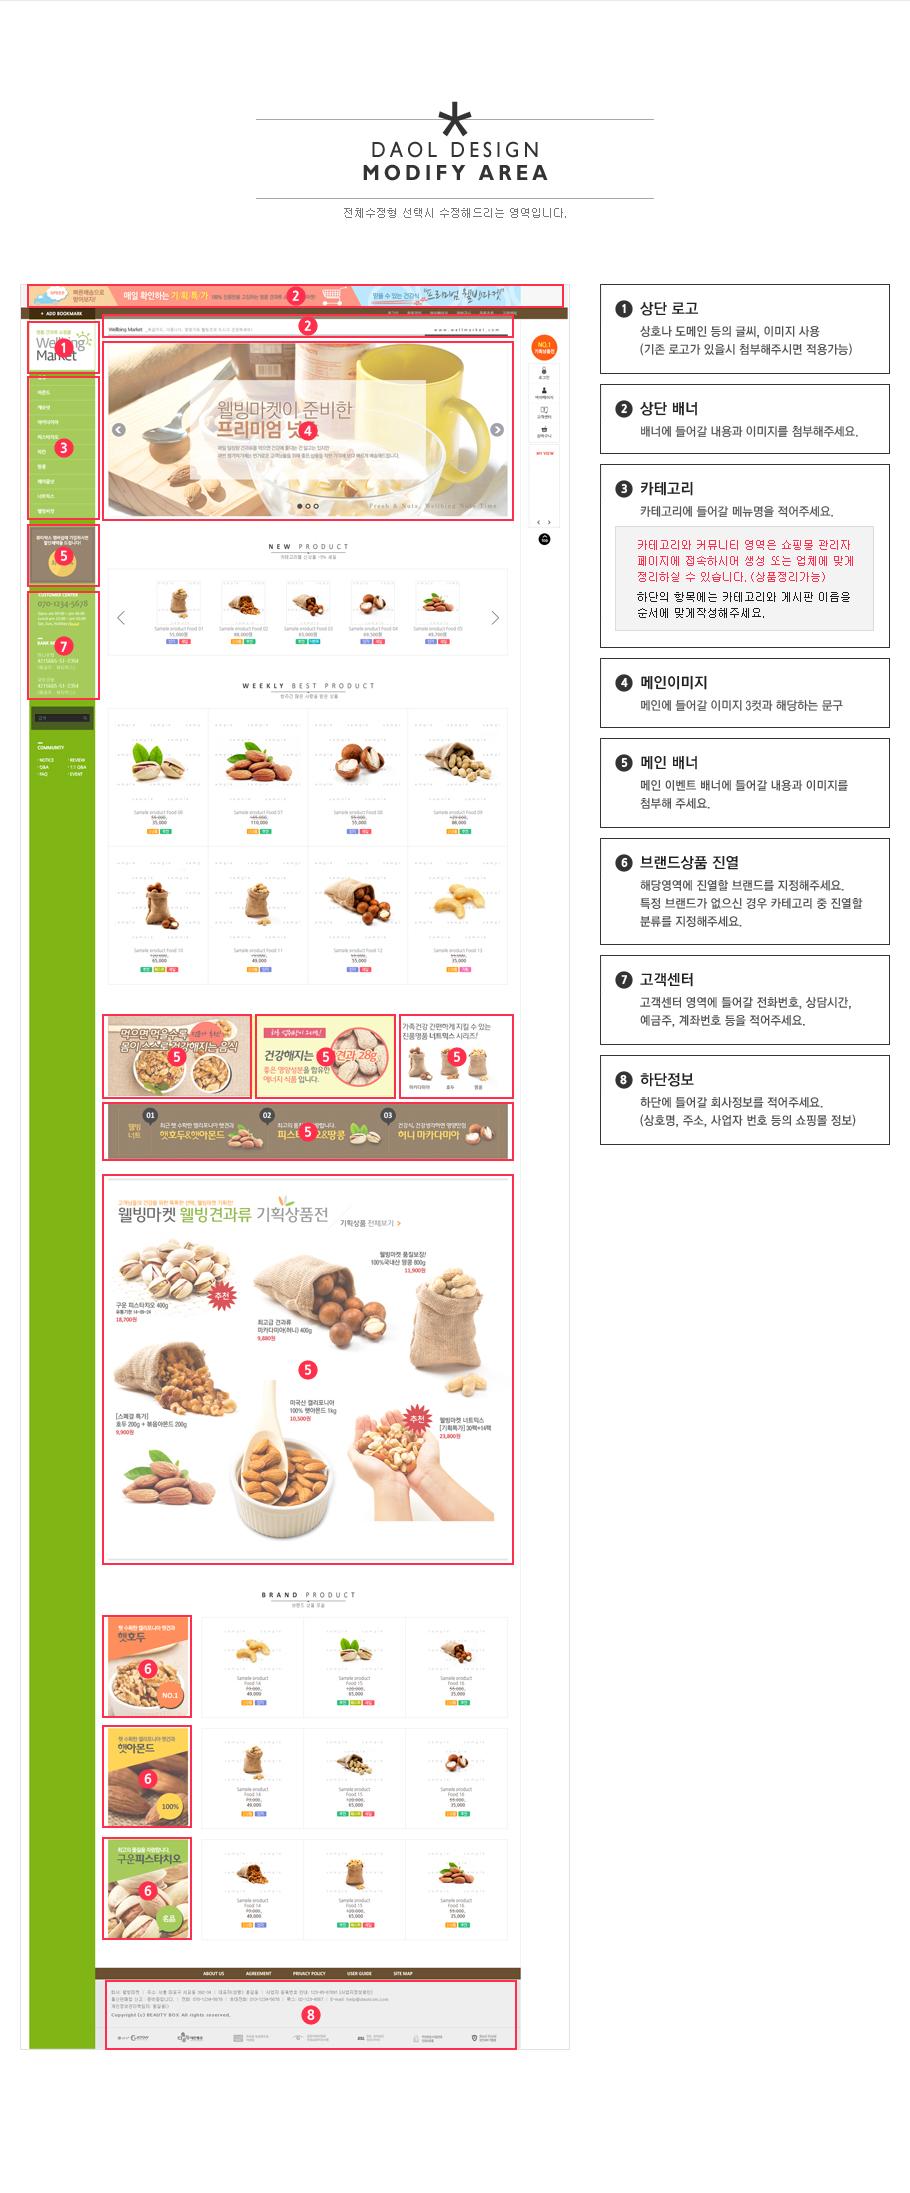 cosmetic1_상품상세페이지